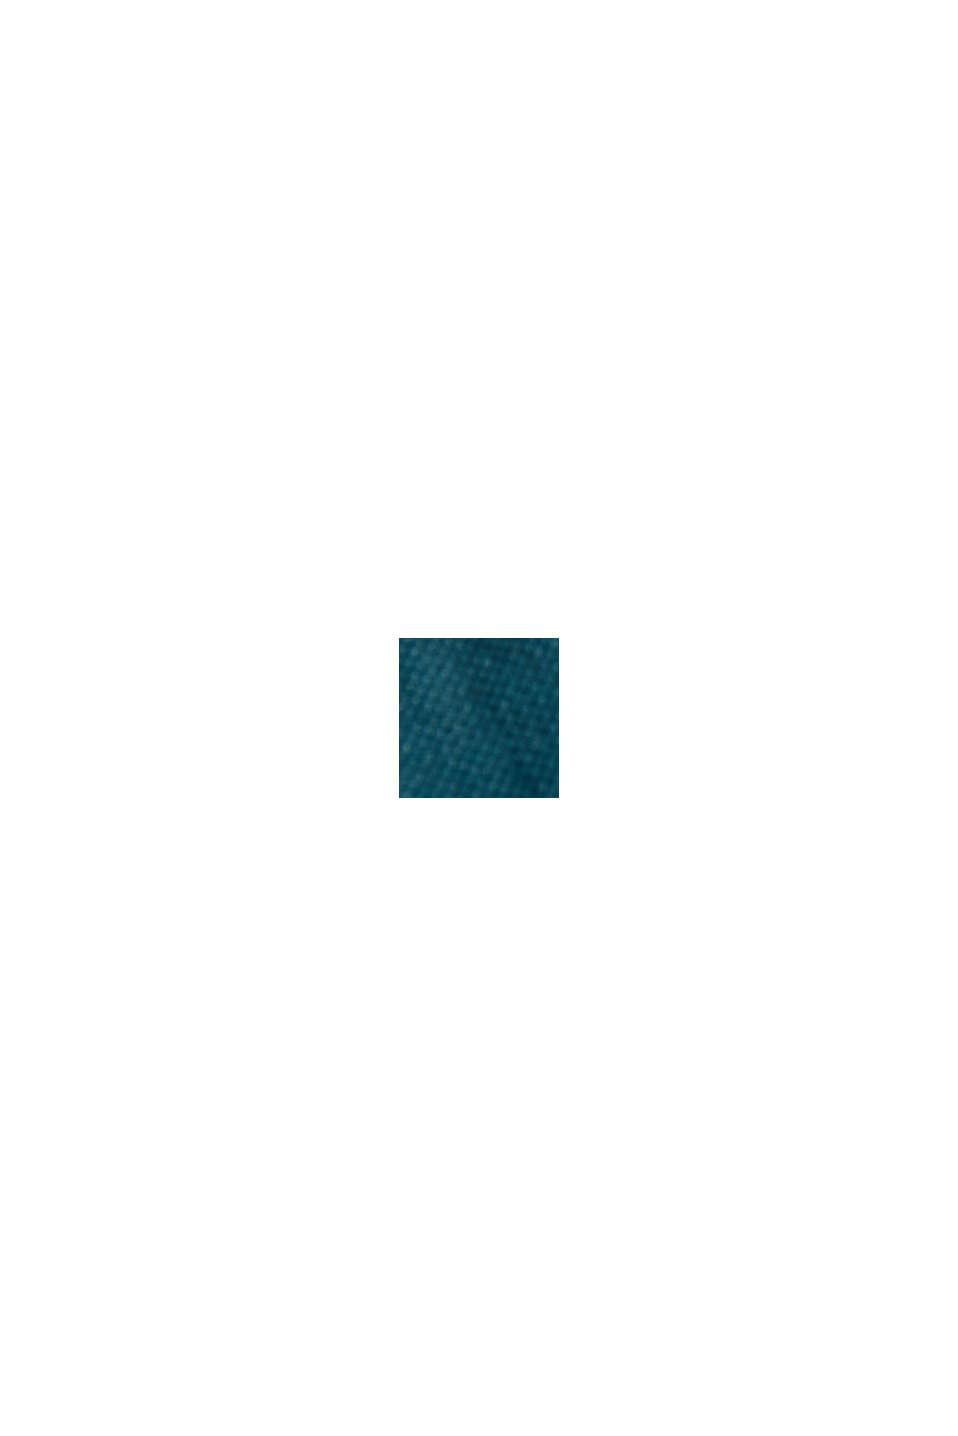 Jurk met ceintuur van LENZING™ ECOVERO™, TEAL GREEN, swatch